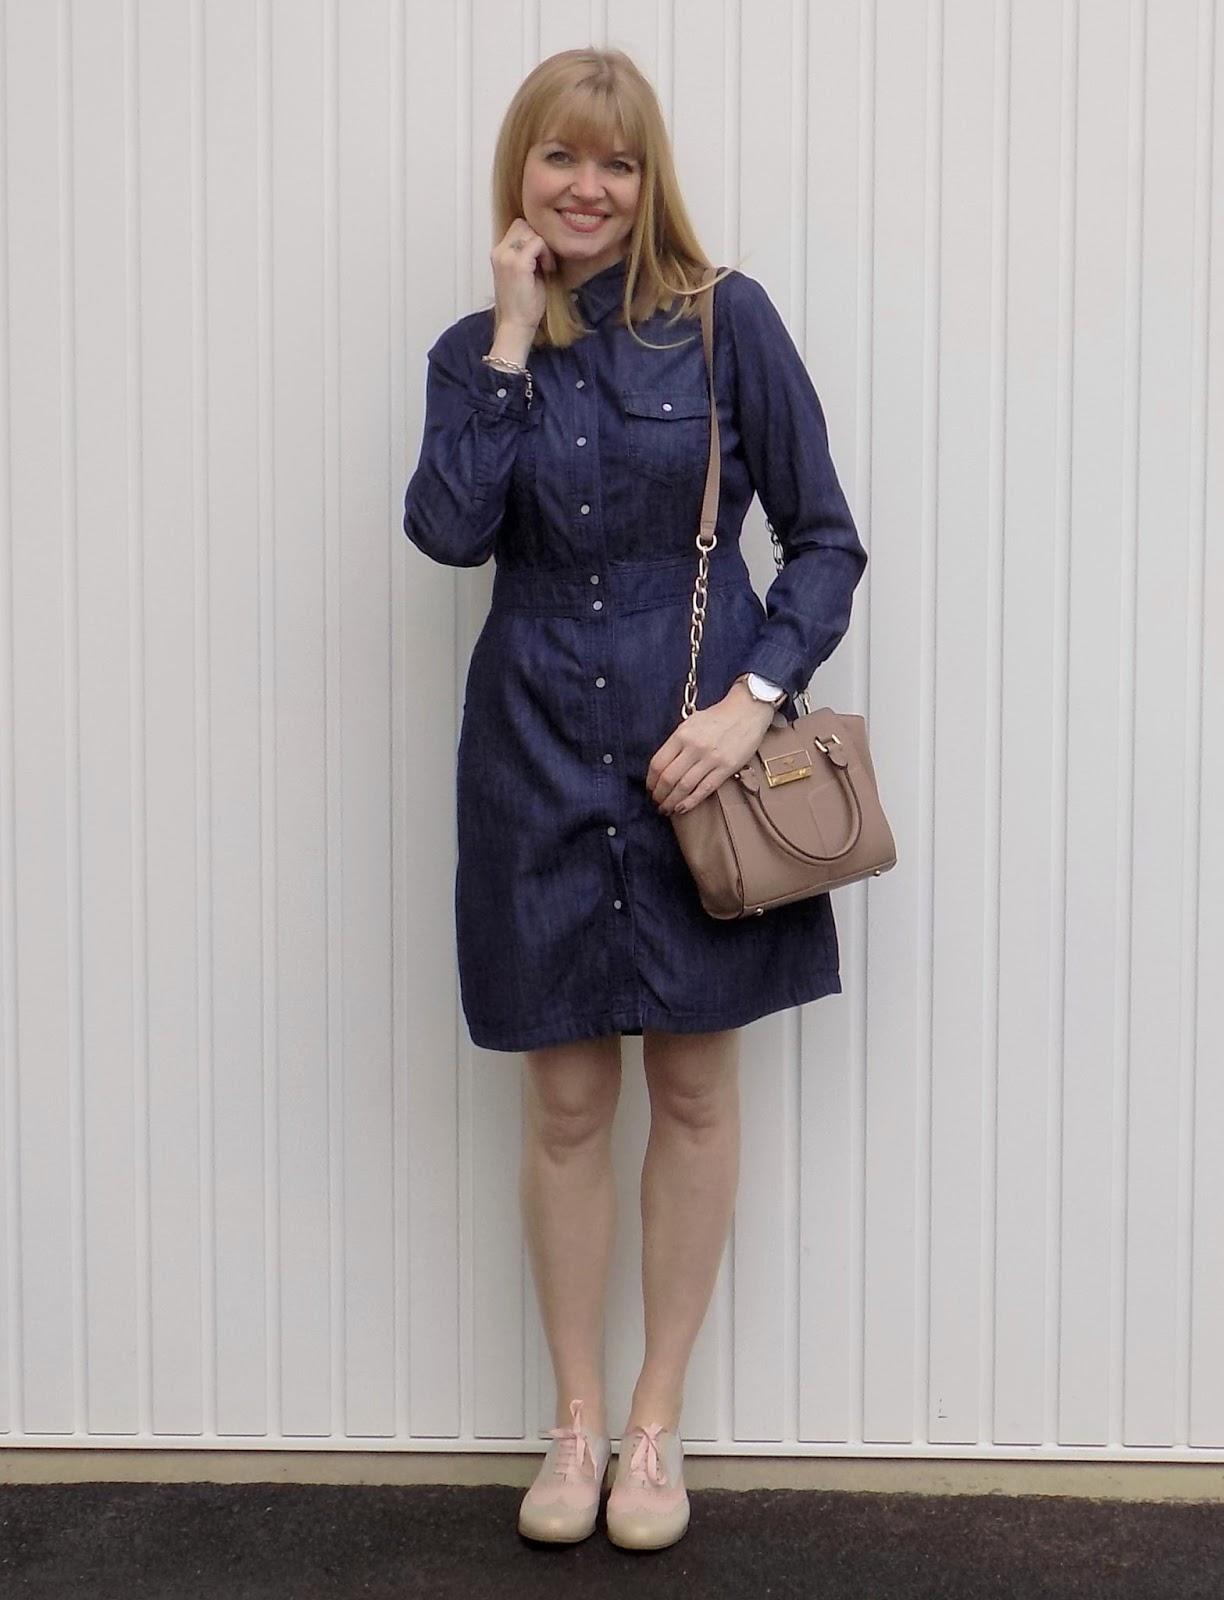 Boden denim shirt dress and brogues with Ilex Alexa bag